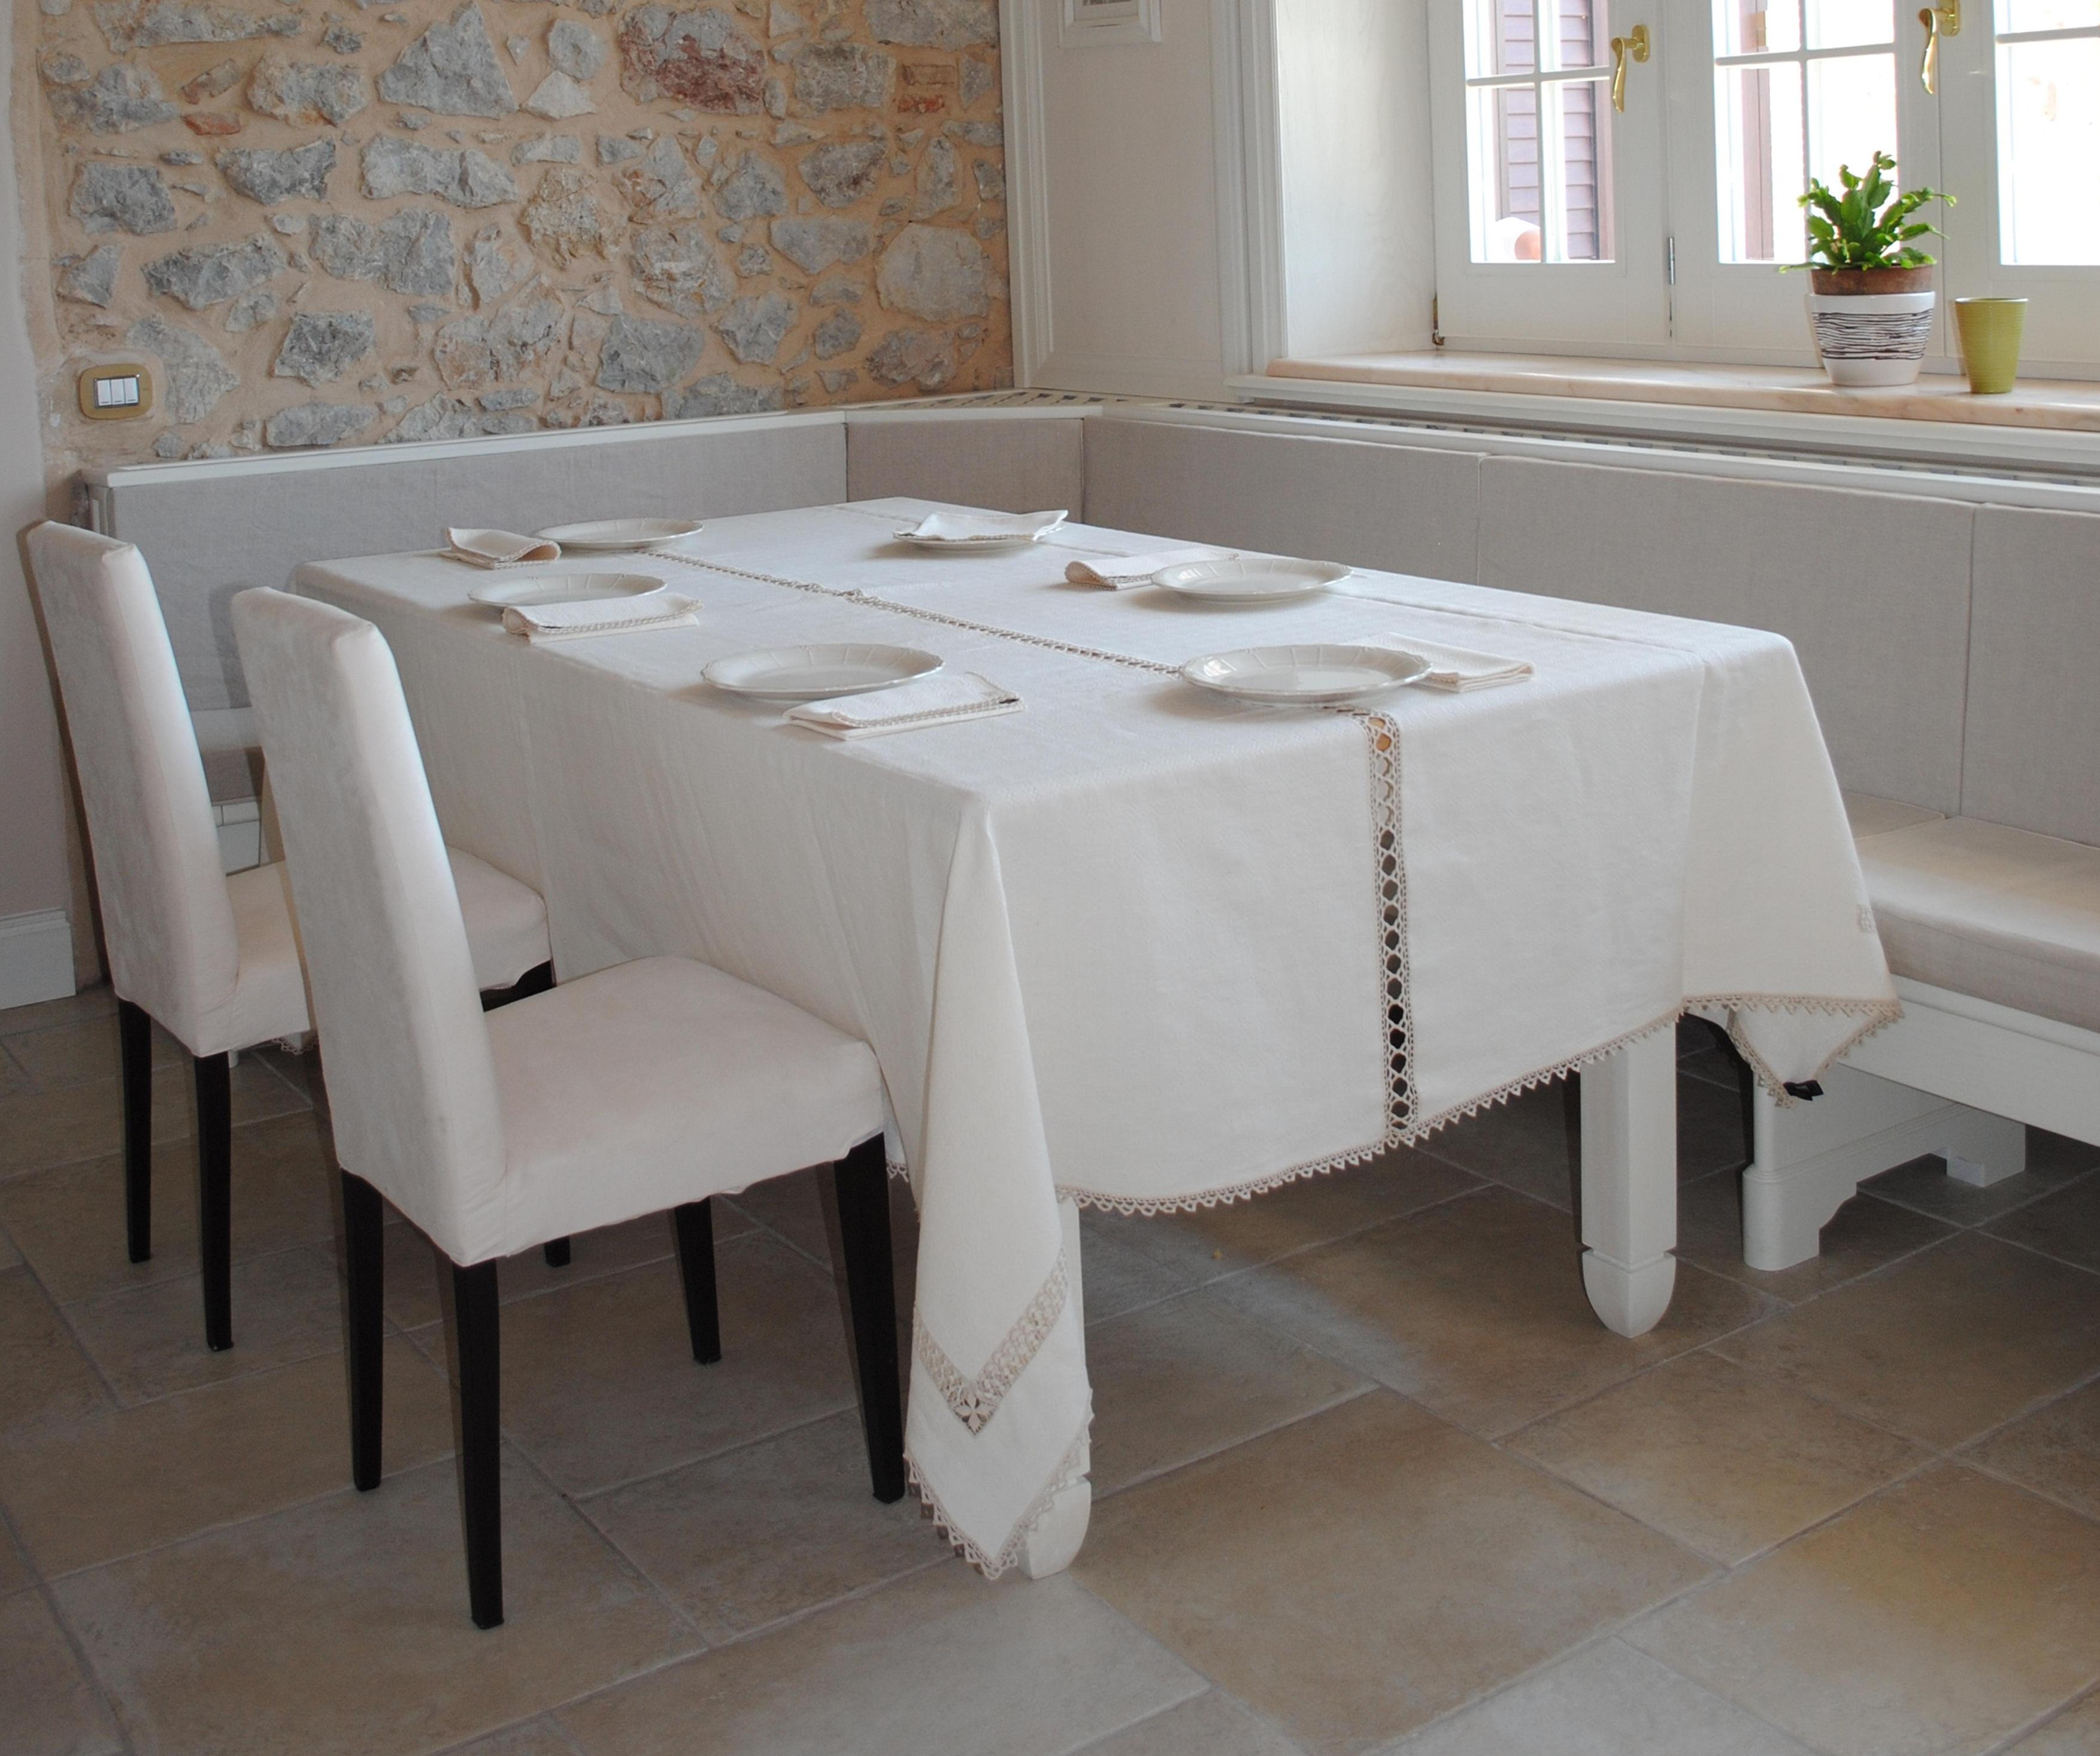 La tela di penelope modello irene - Tovaglie da tavola eleganti moderne ...